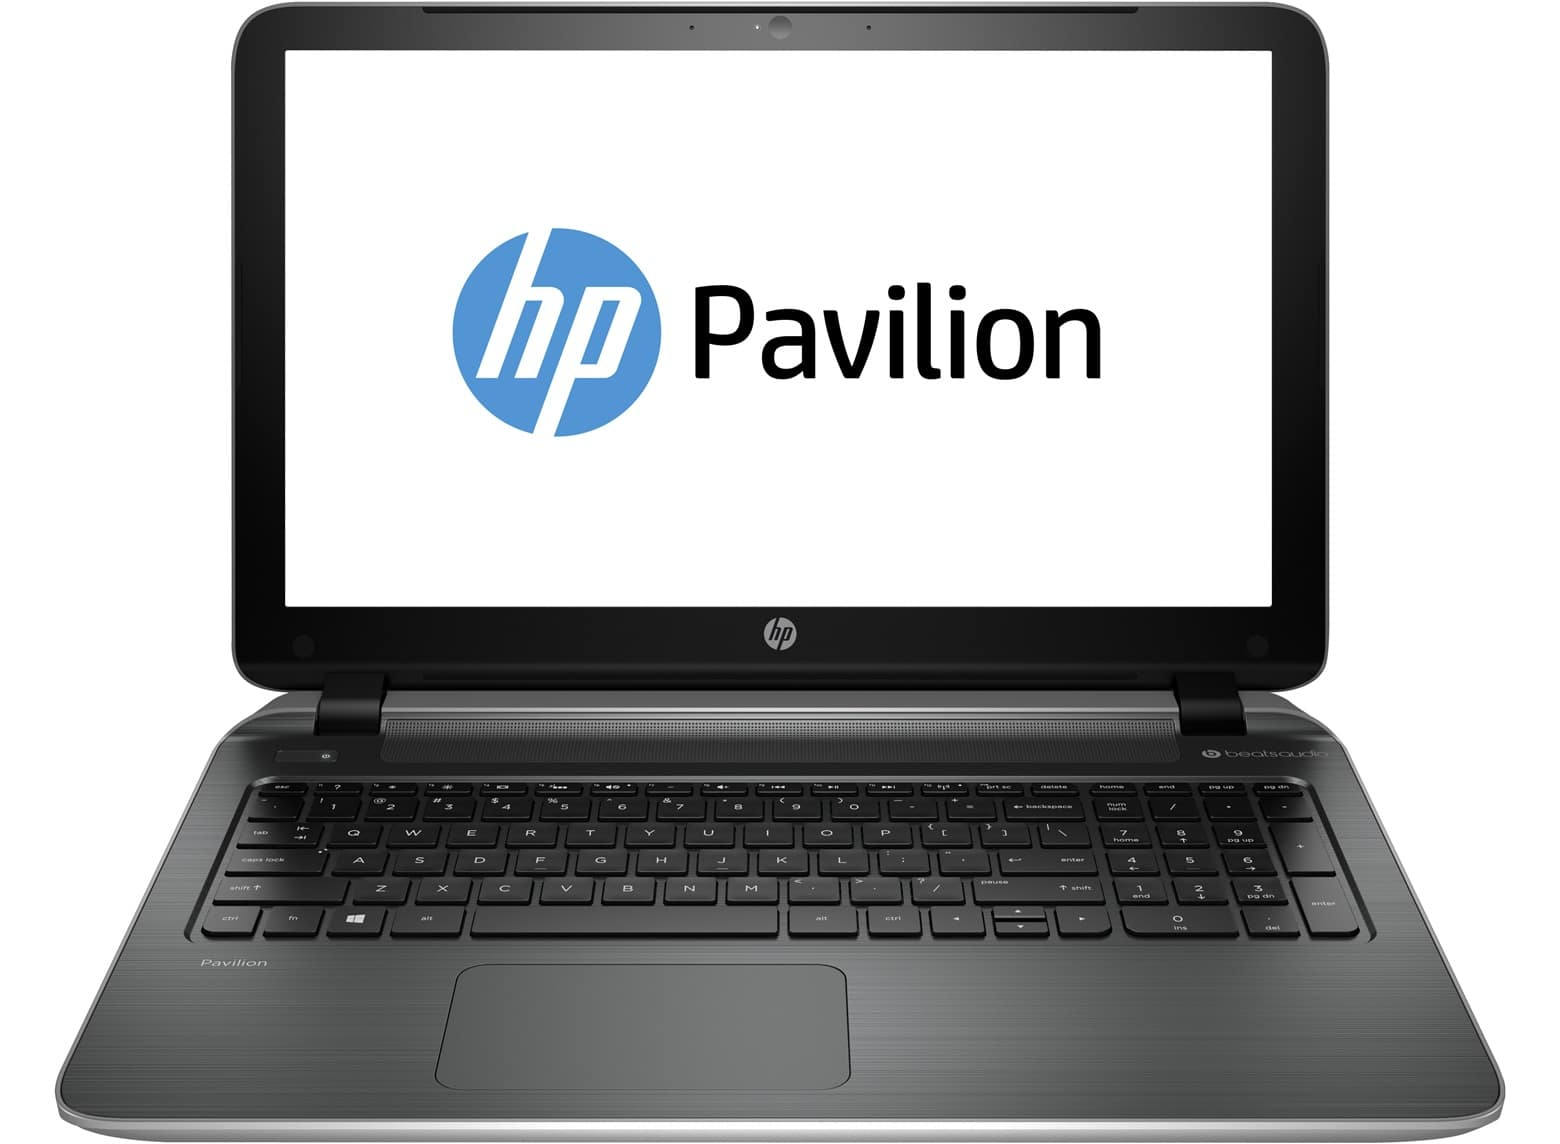 HP Pavilion 15-p207nf 1